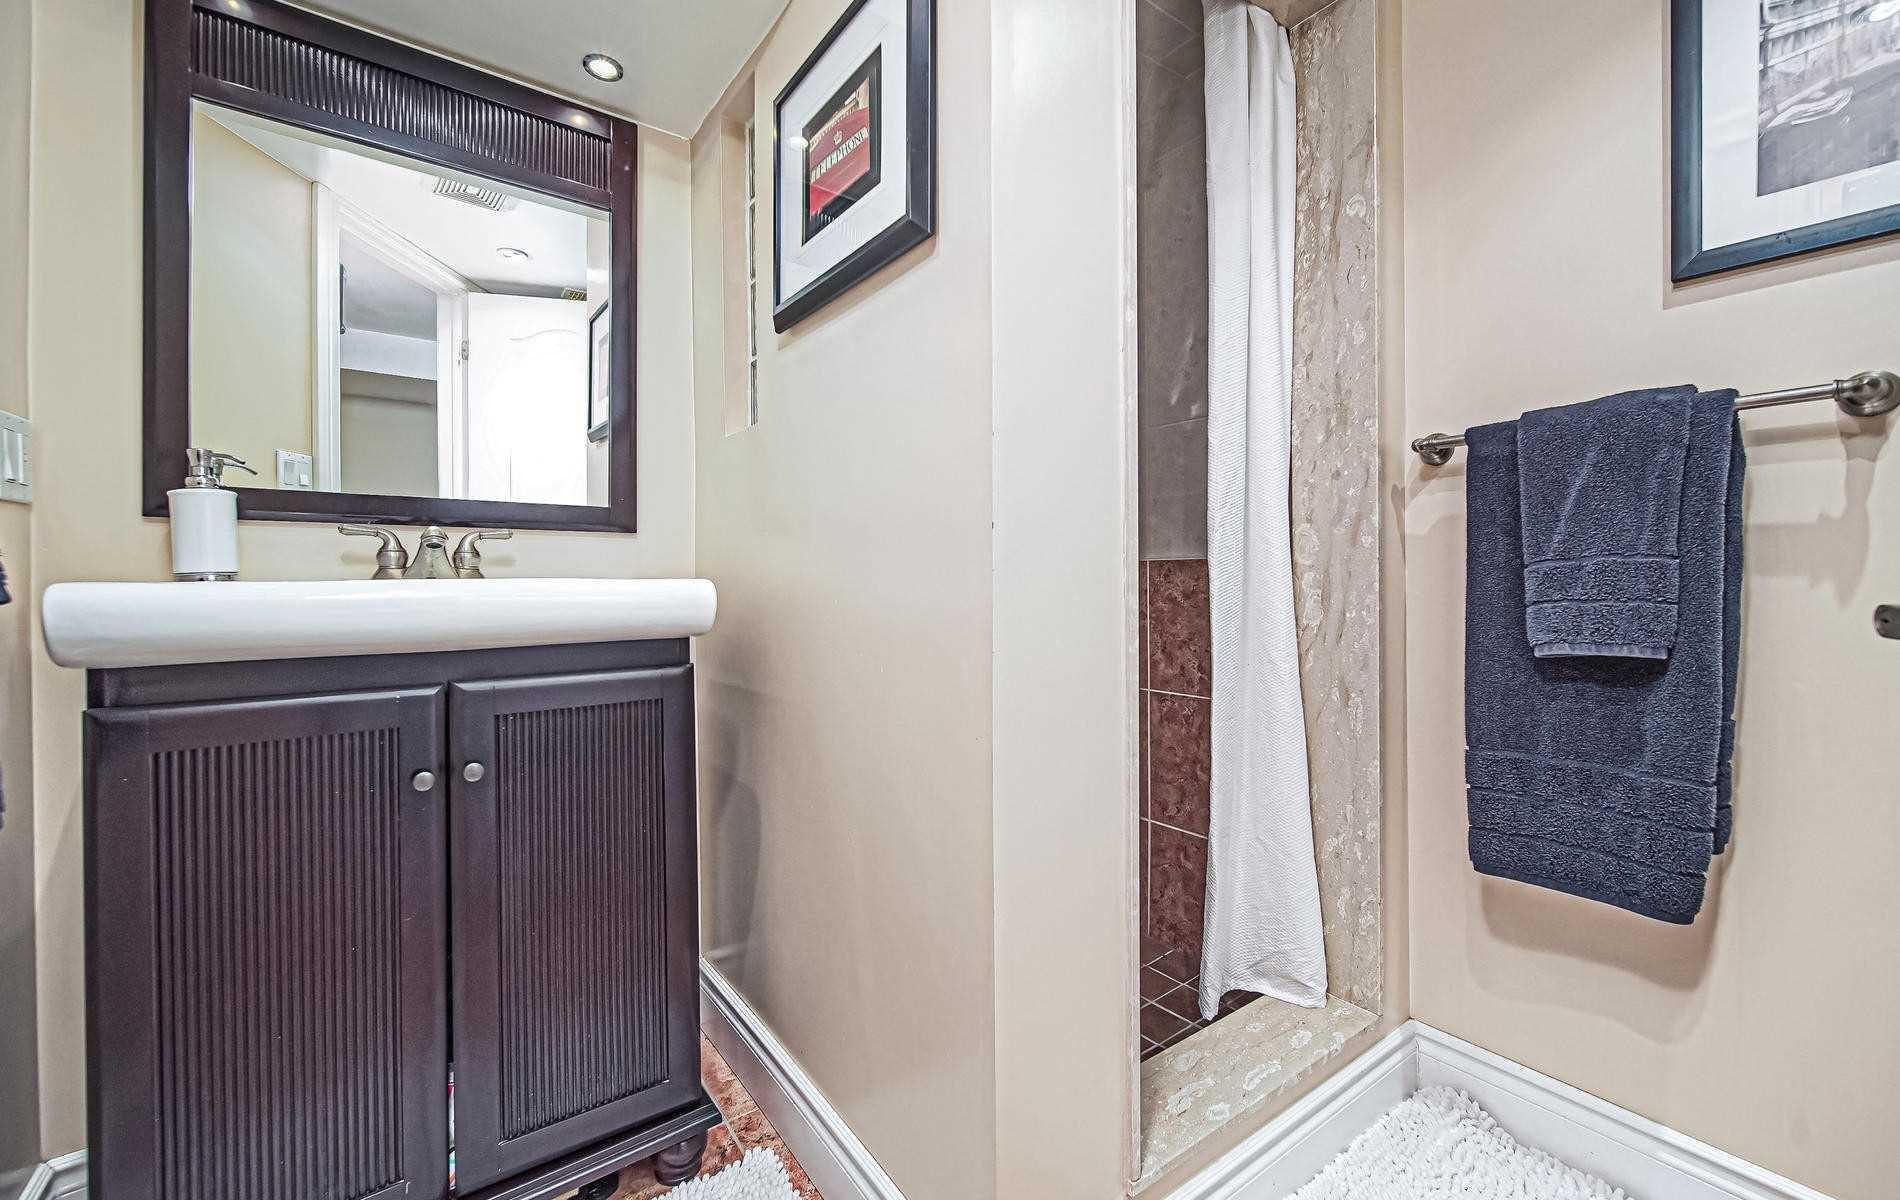 Photo 16: Photos: 84 Rushbrooke Avenue in Toronto: South Riverdale House (2-Storey) for sale (Toronto E01)  : MLS®# E4600791